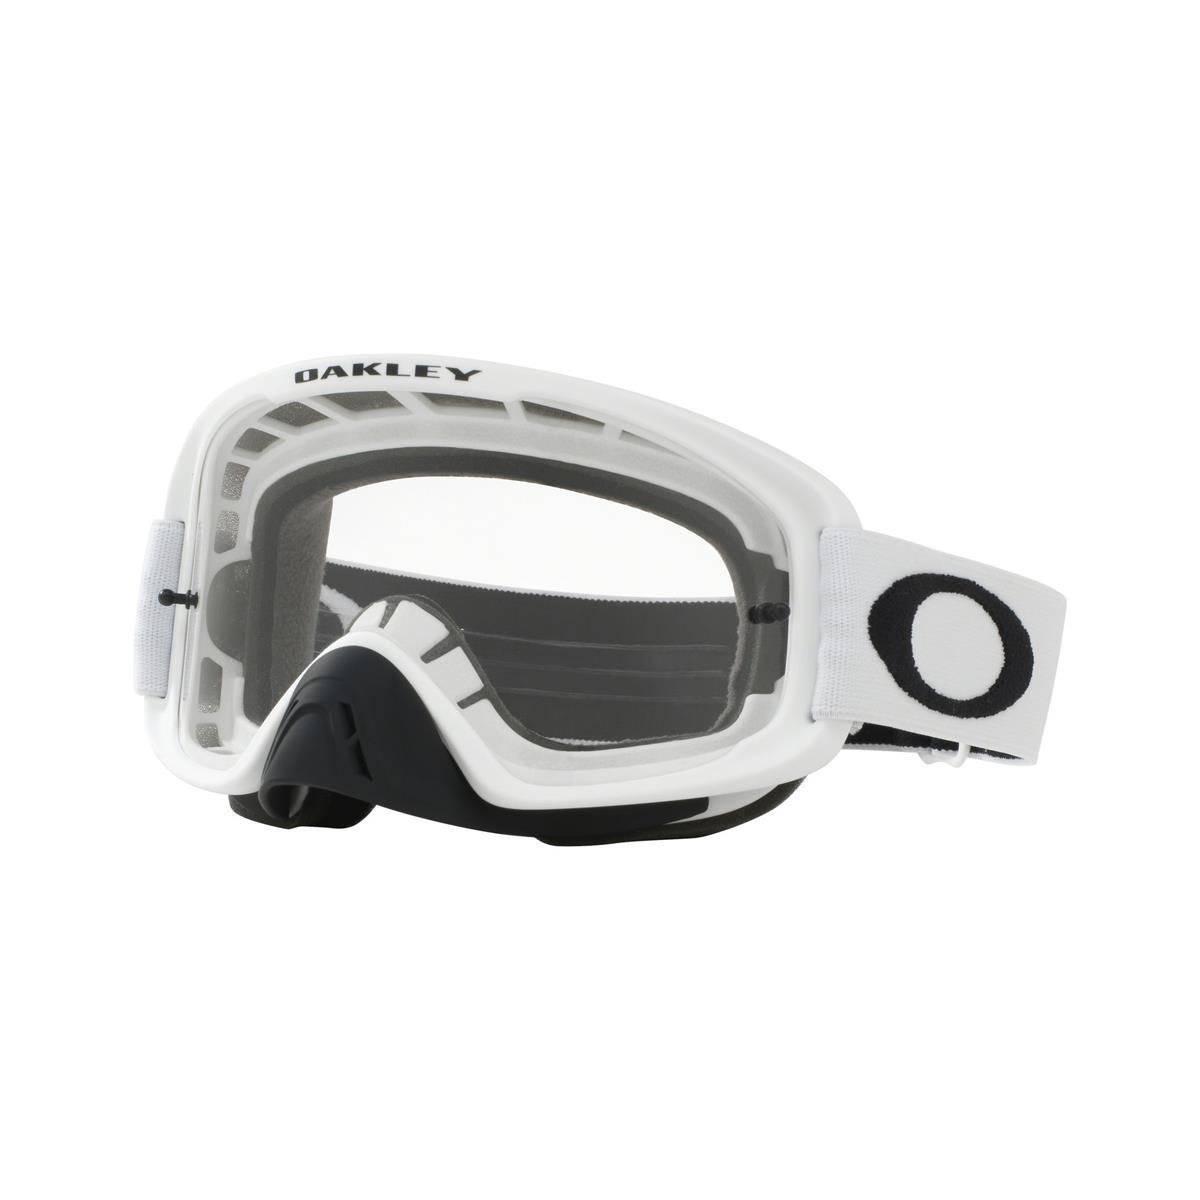 Oakley Crossbrille O Frame 2.0 MX Matt Weiß - Klar & Dunkelgrau